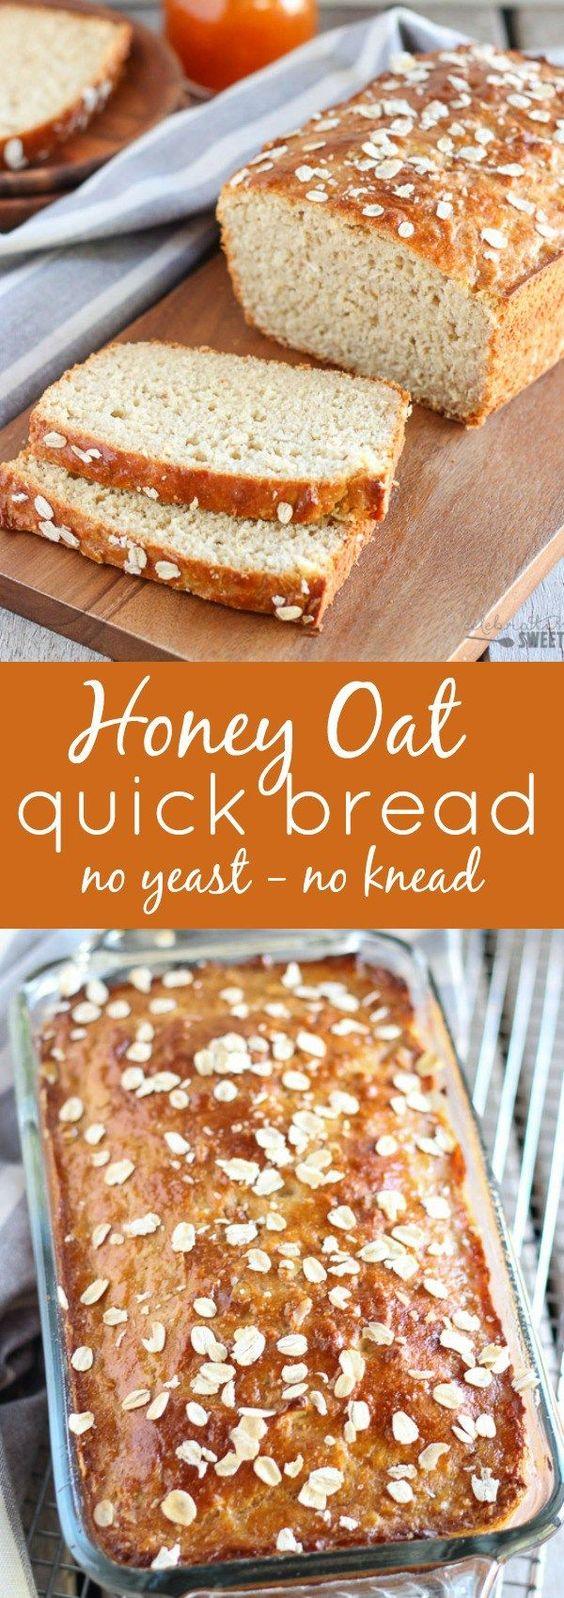 Honey Oat Quick Bread (no yeast, no knead)   Recipe   Quick Bread ...